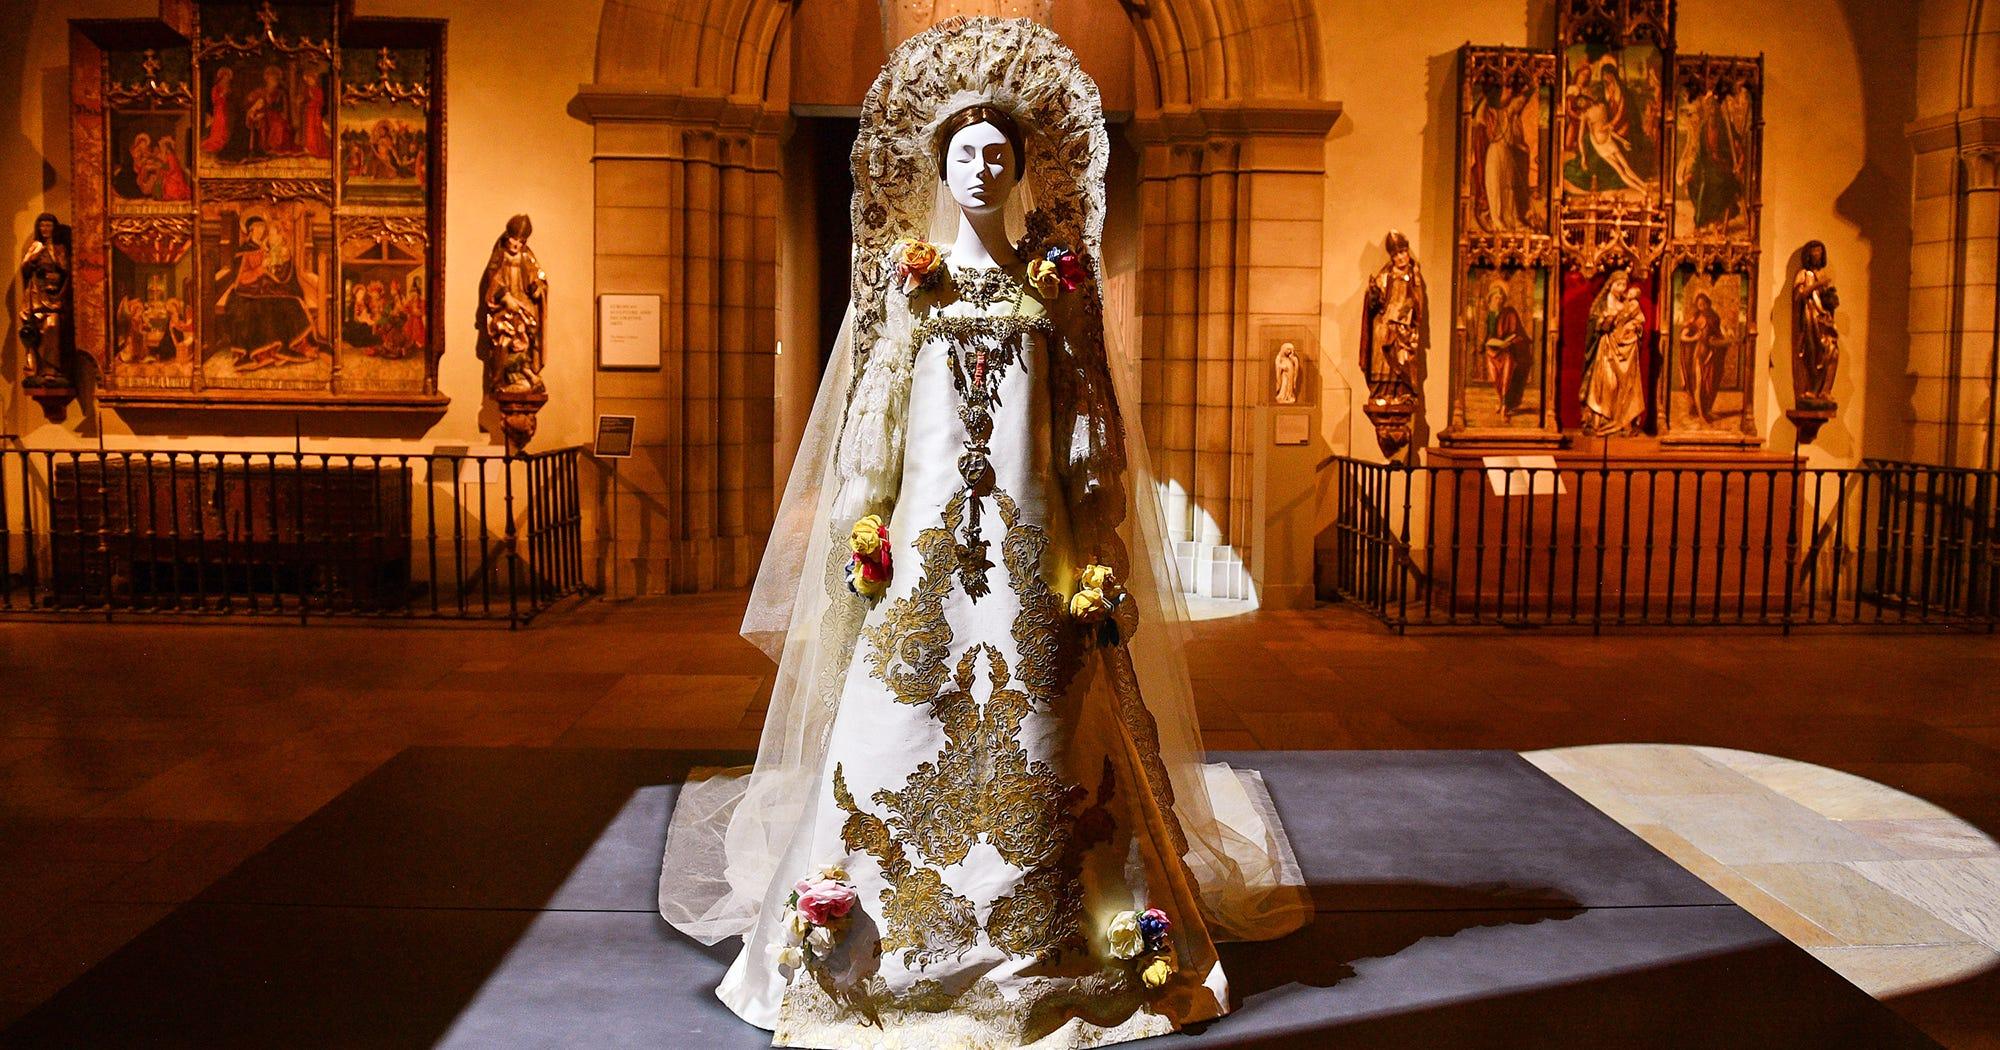 Over One Million People Have Seen The Met's 'Heavenly Bodies' Exhibit